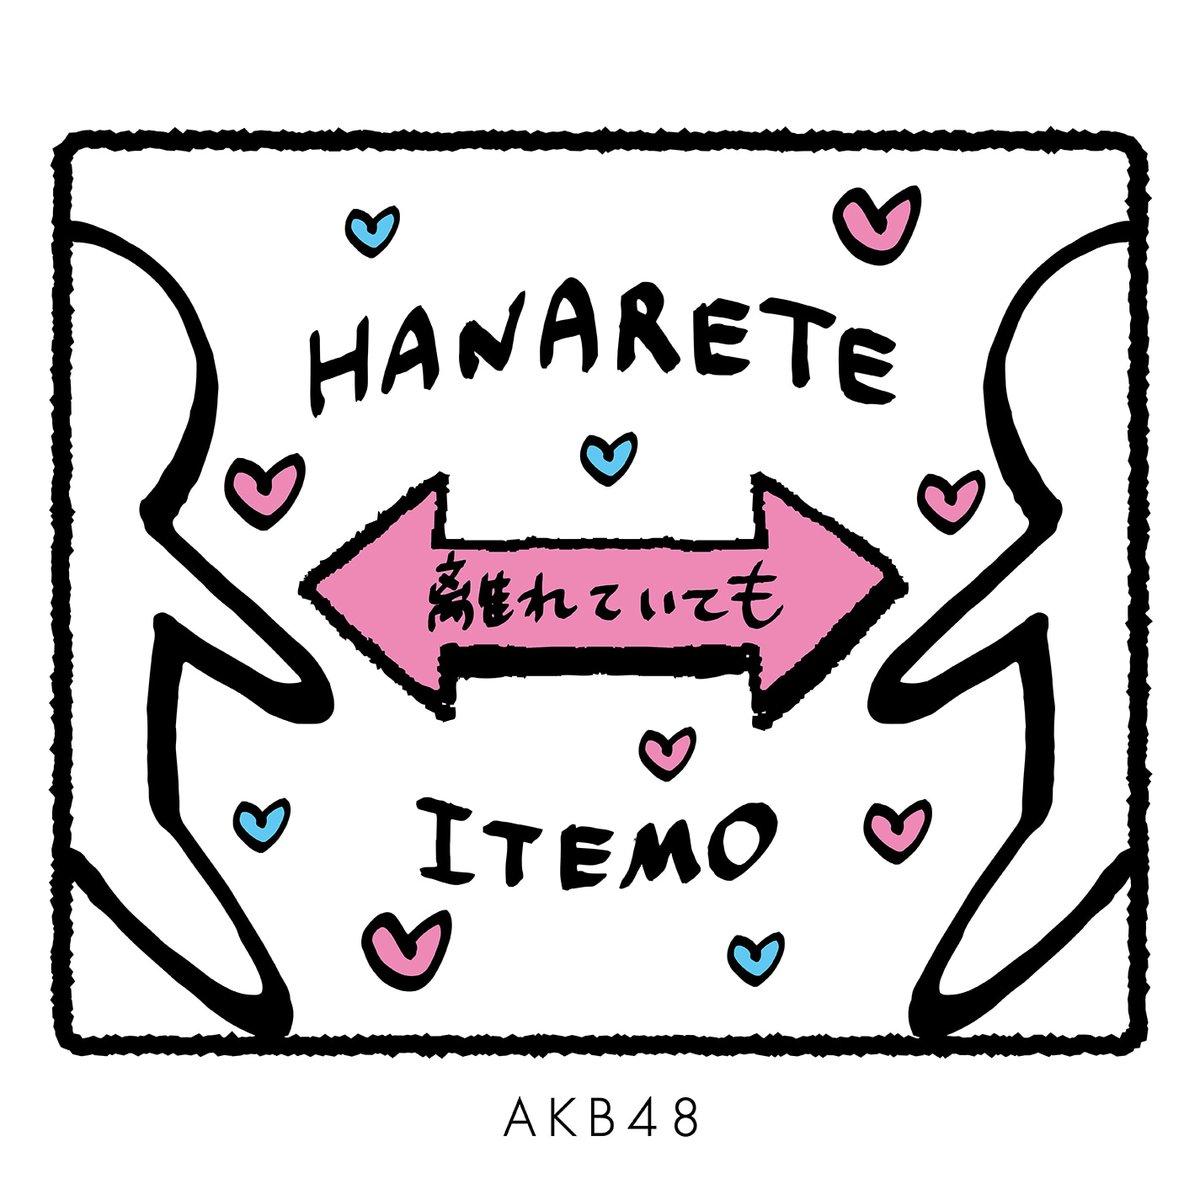 AKB48 - 離れていても